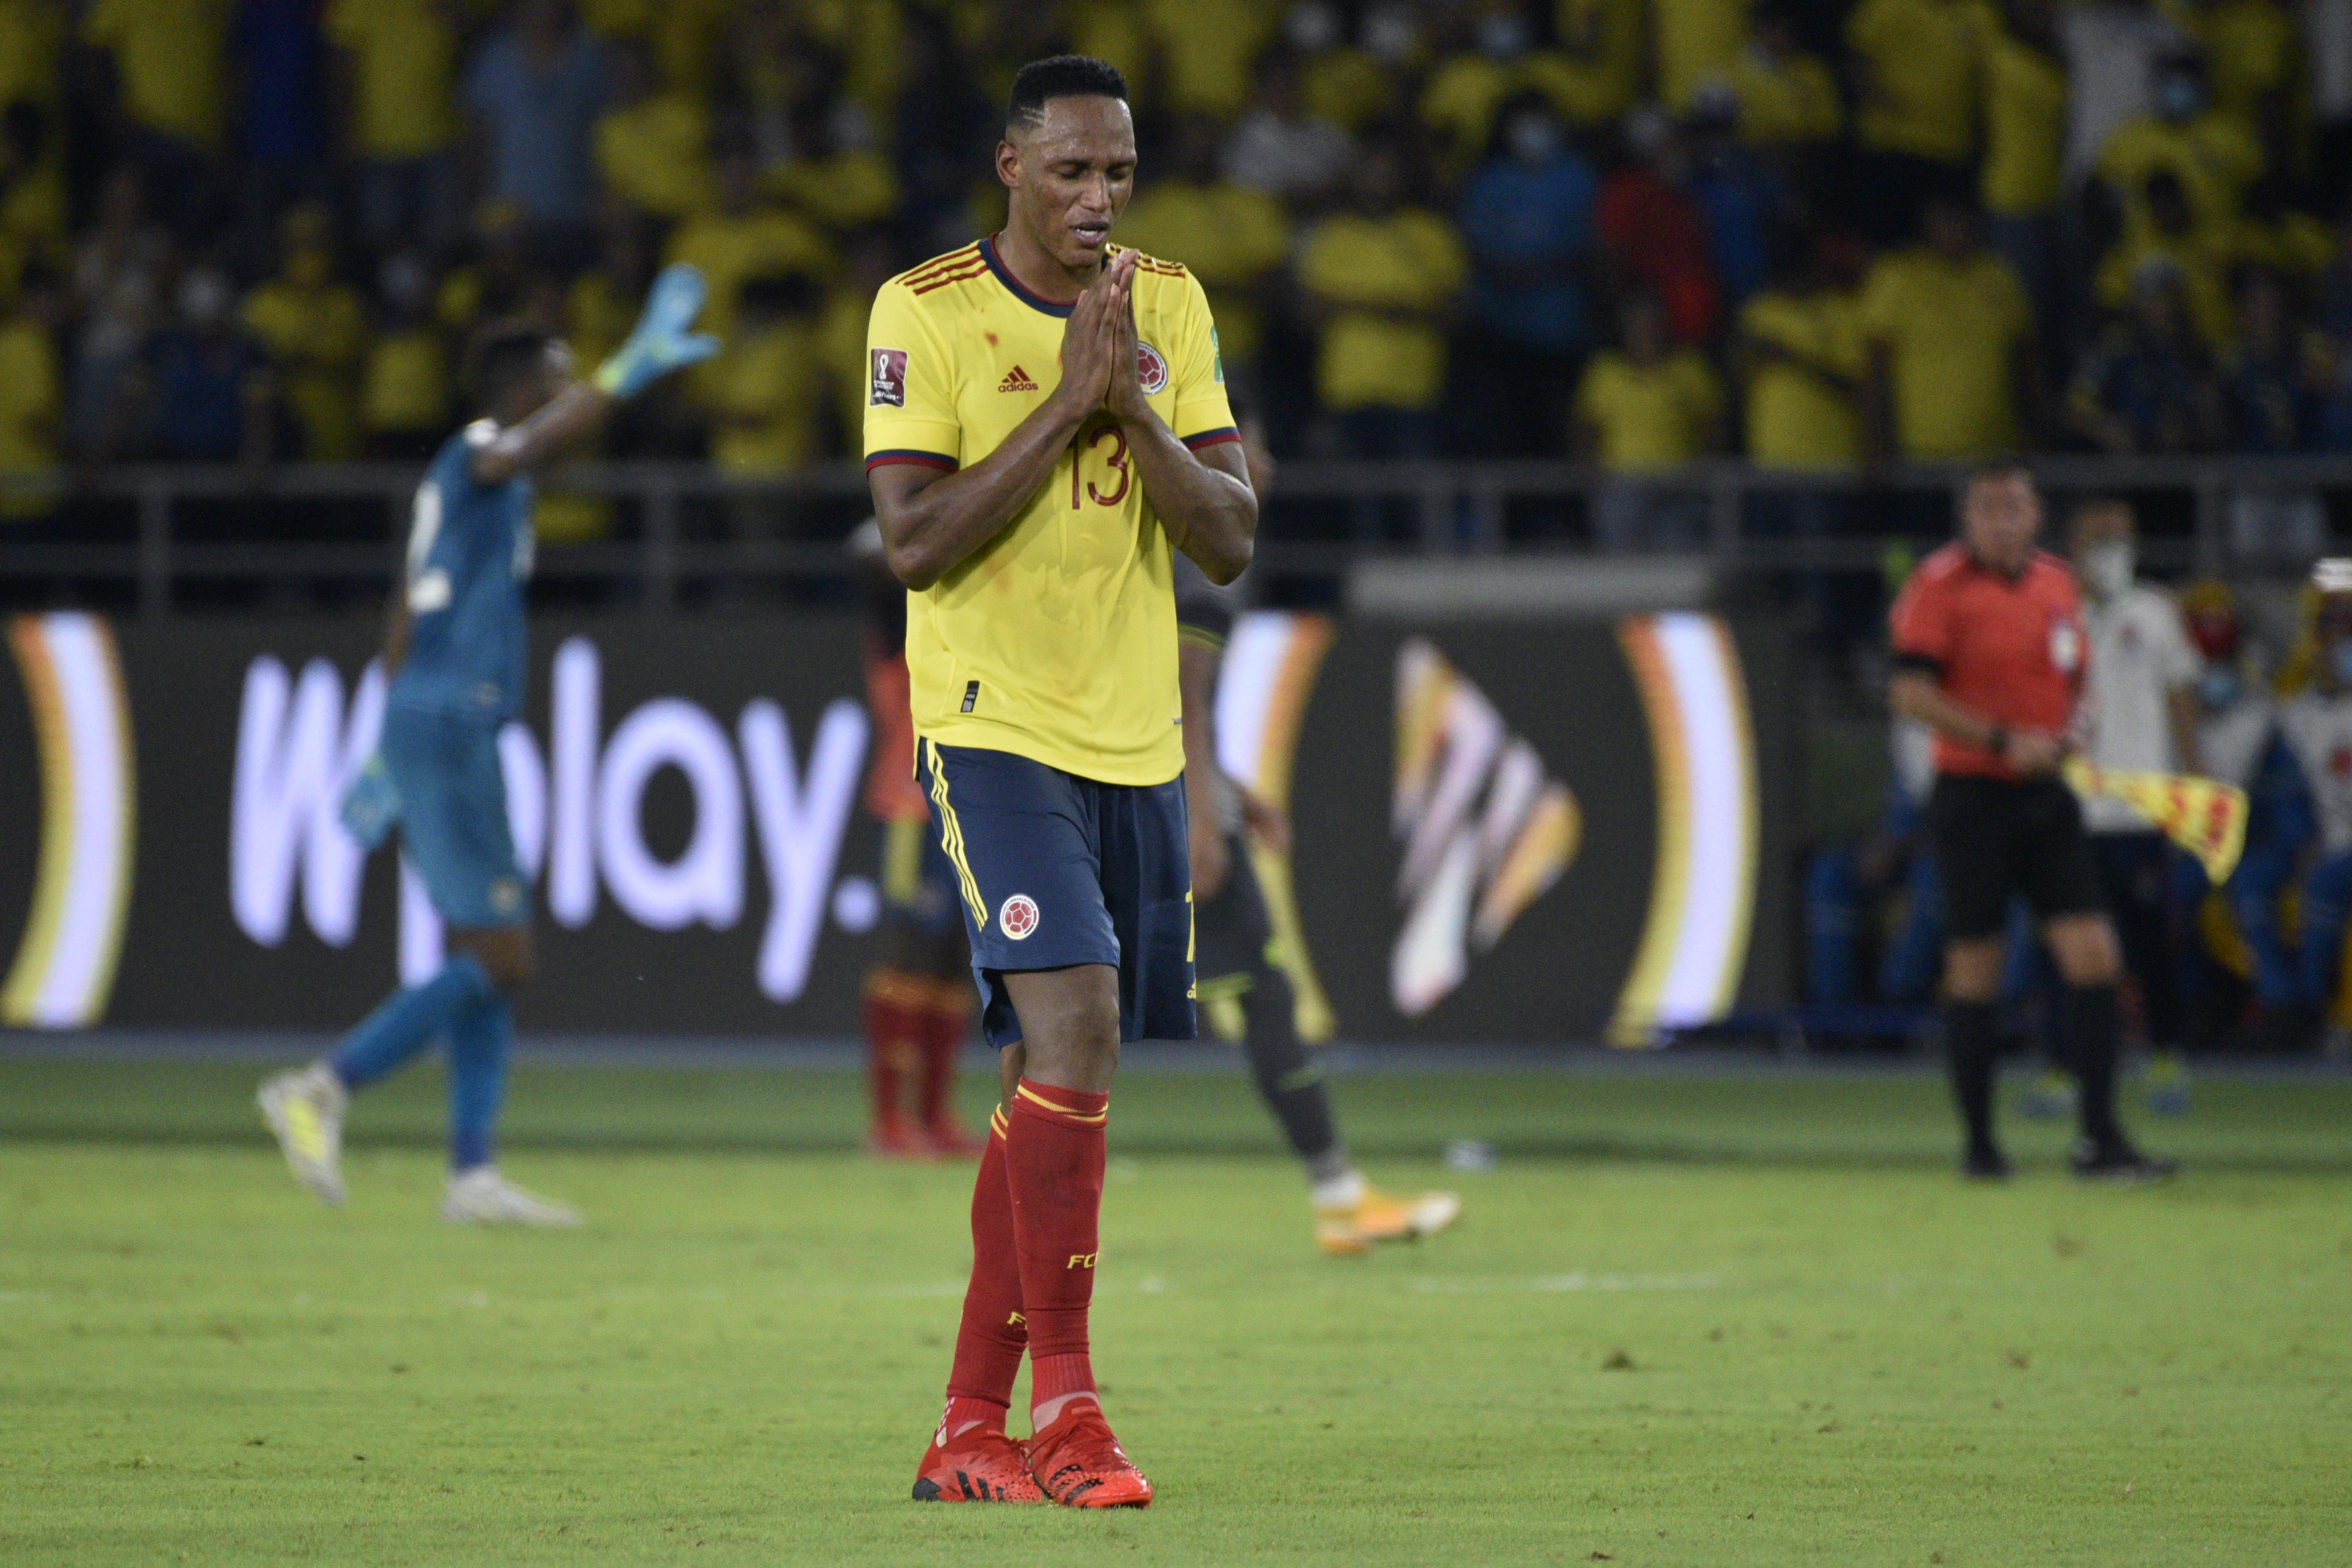 Colombia v Ecuador - FIFA World Cup 2022 Qatar Qualifier